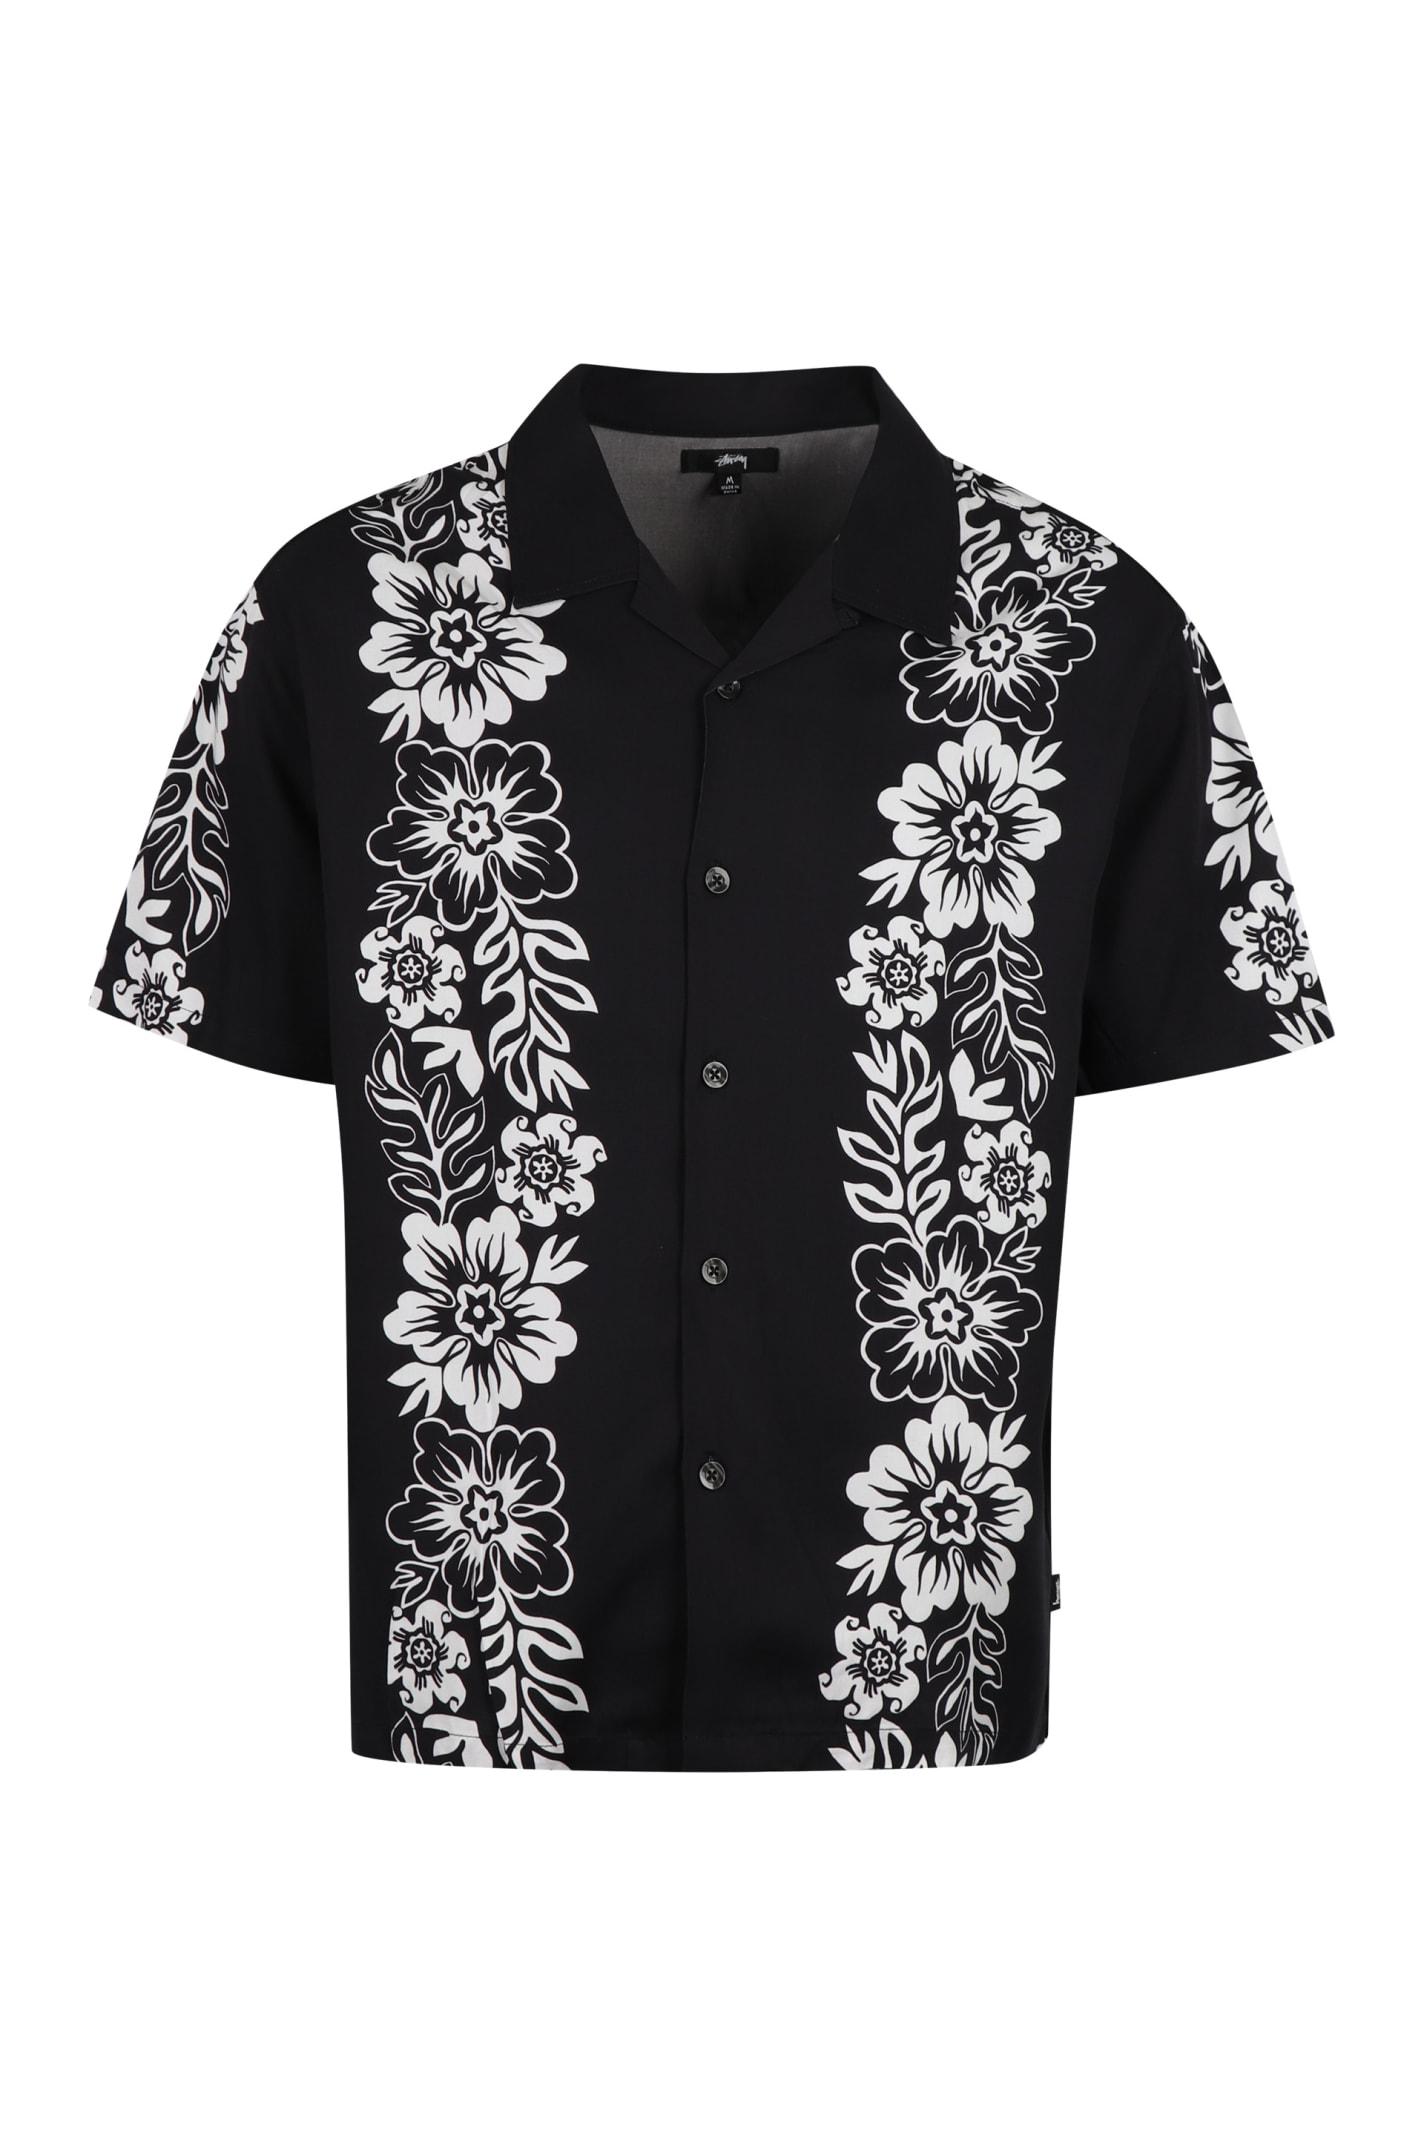 Stussy Printed Short Sleeve Shirt